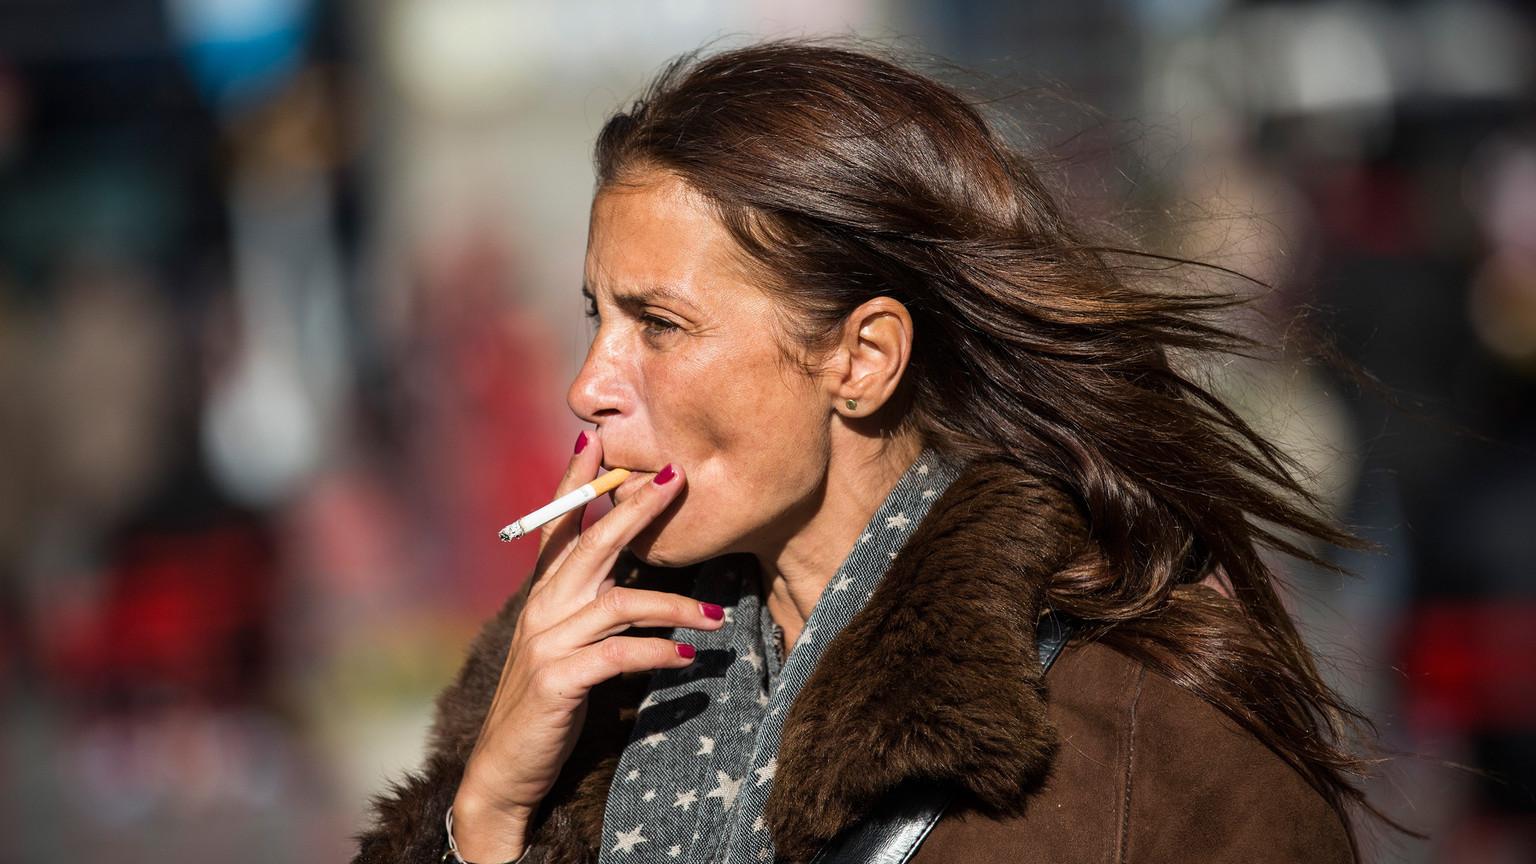 Dohányzó nő a New York-i Times Square-en. (Fotó: Getty Images)